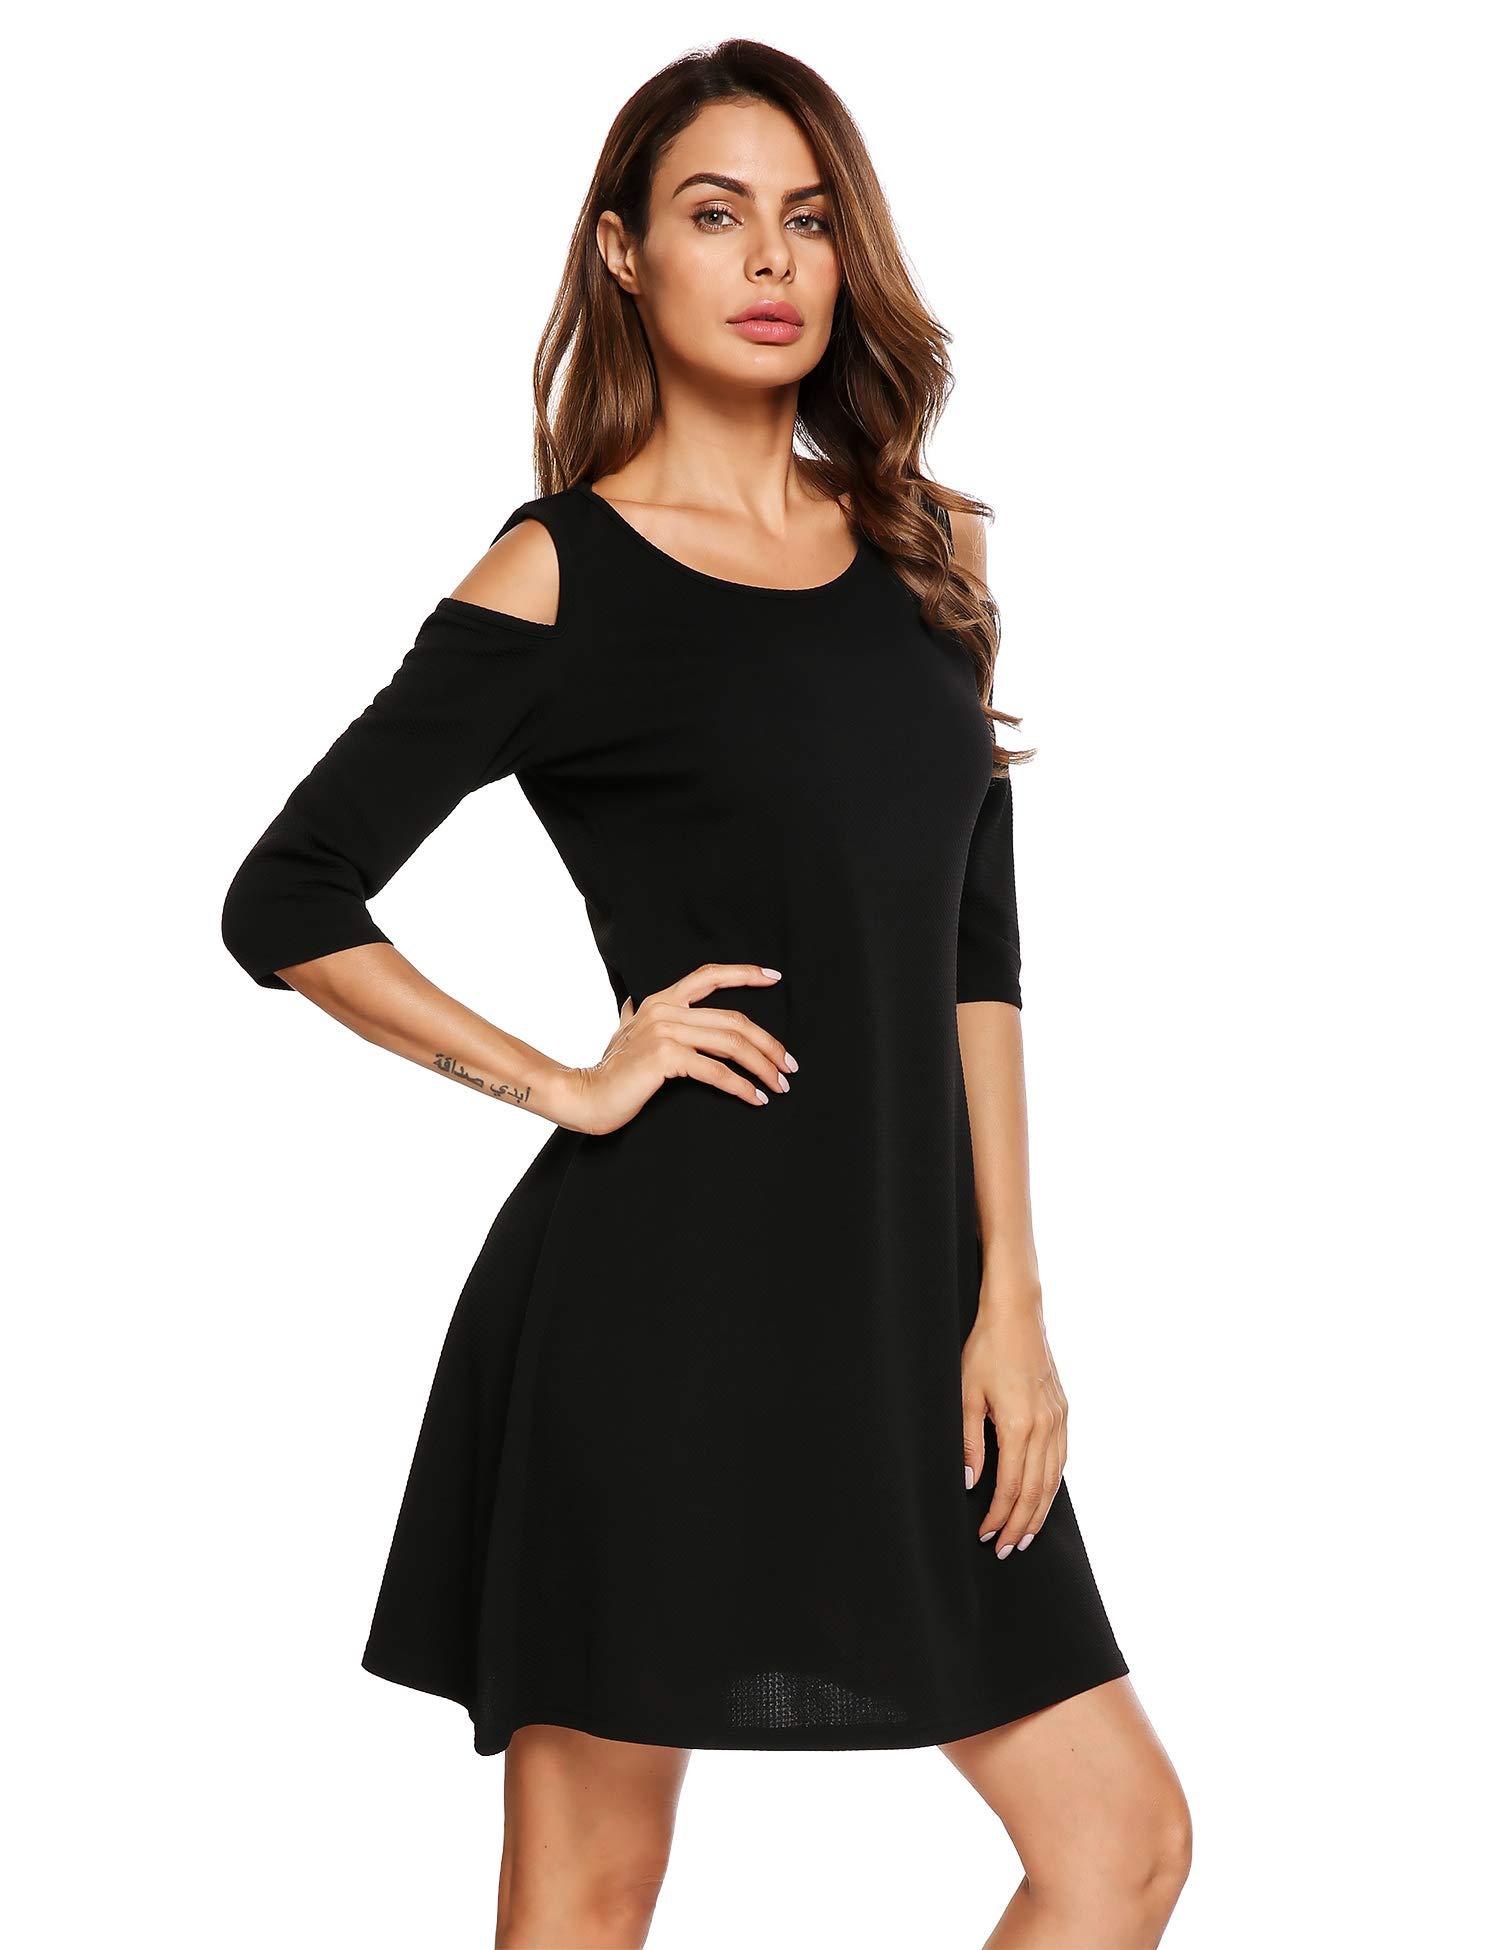 Beyove Women Casual Cold Shoulder Tunic Top Swing T-Shirt Loose Dress 3/4 Sleeve Black